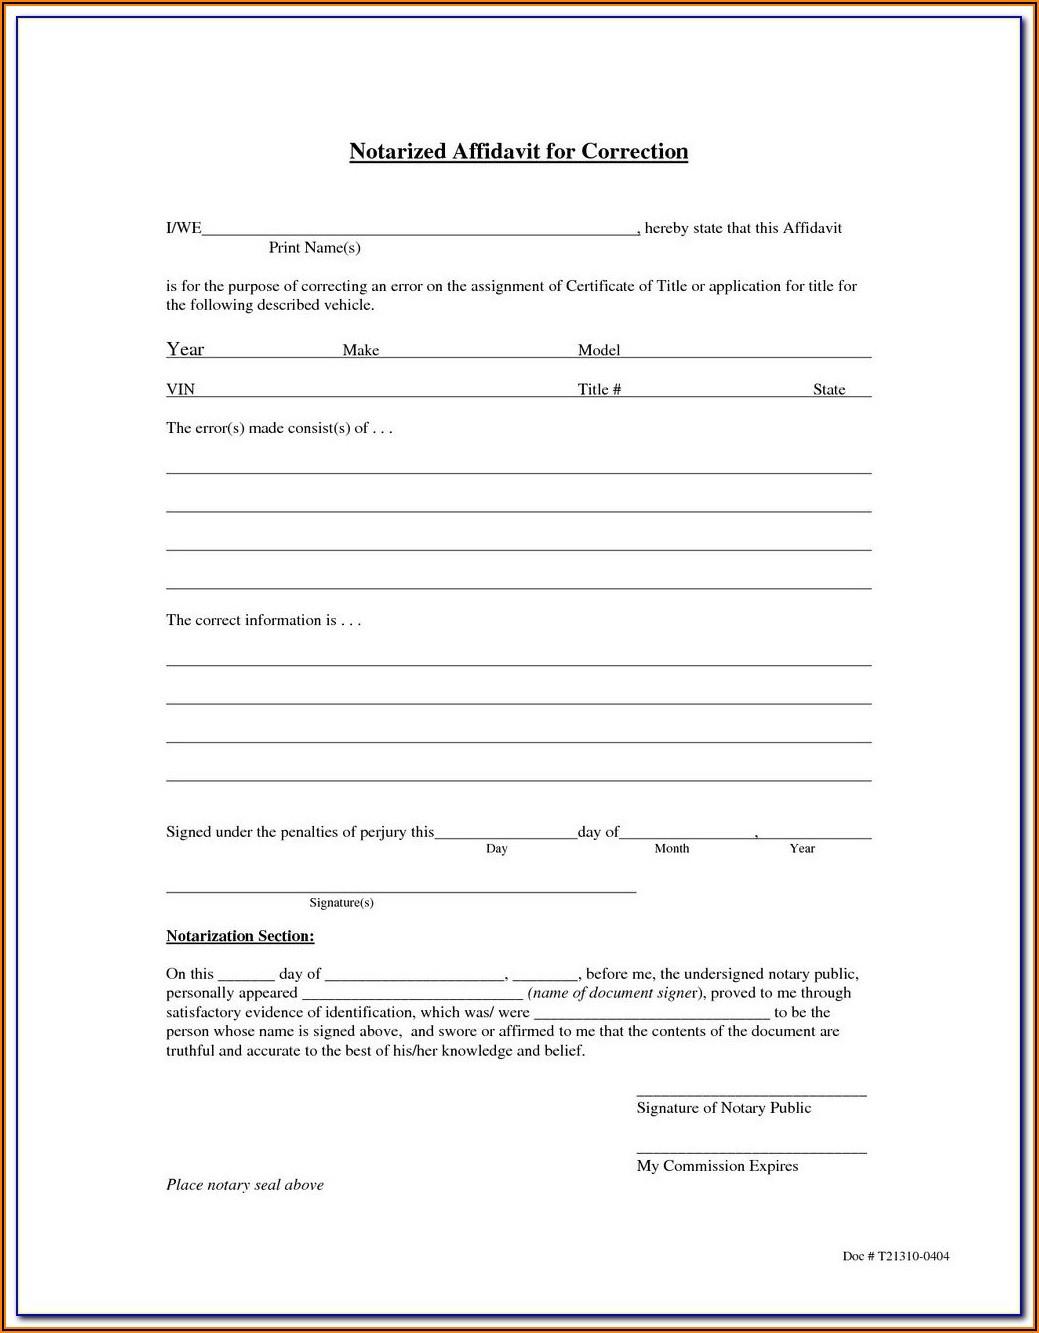 California Notary Public Affidavit Form